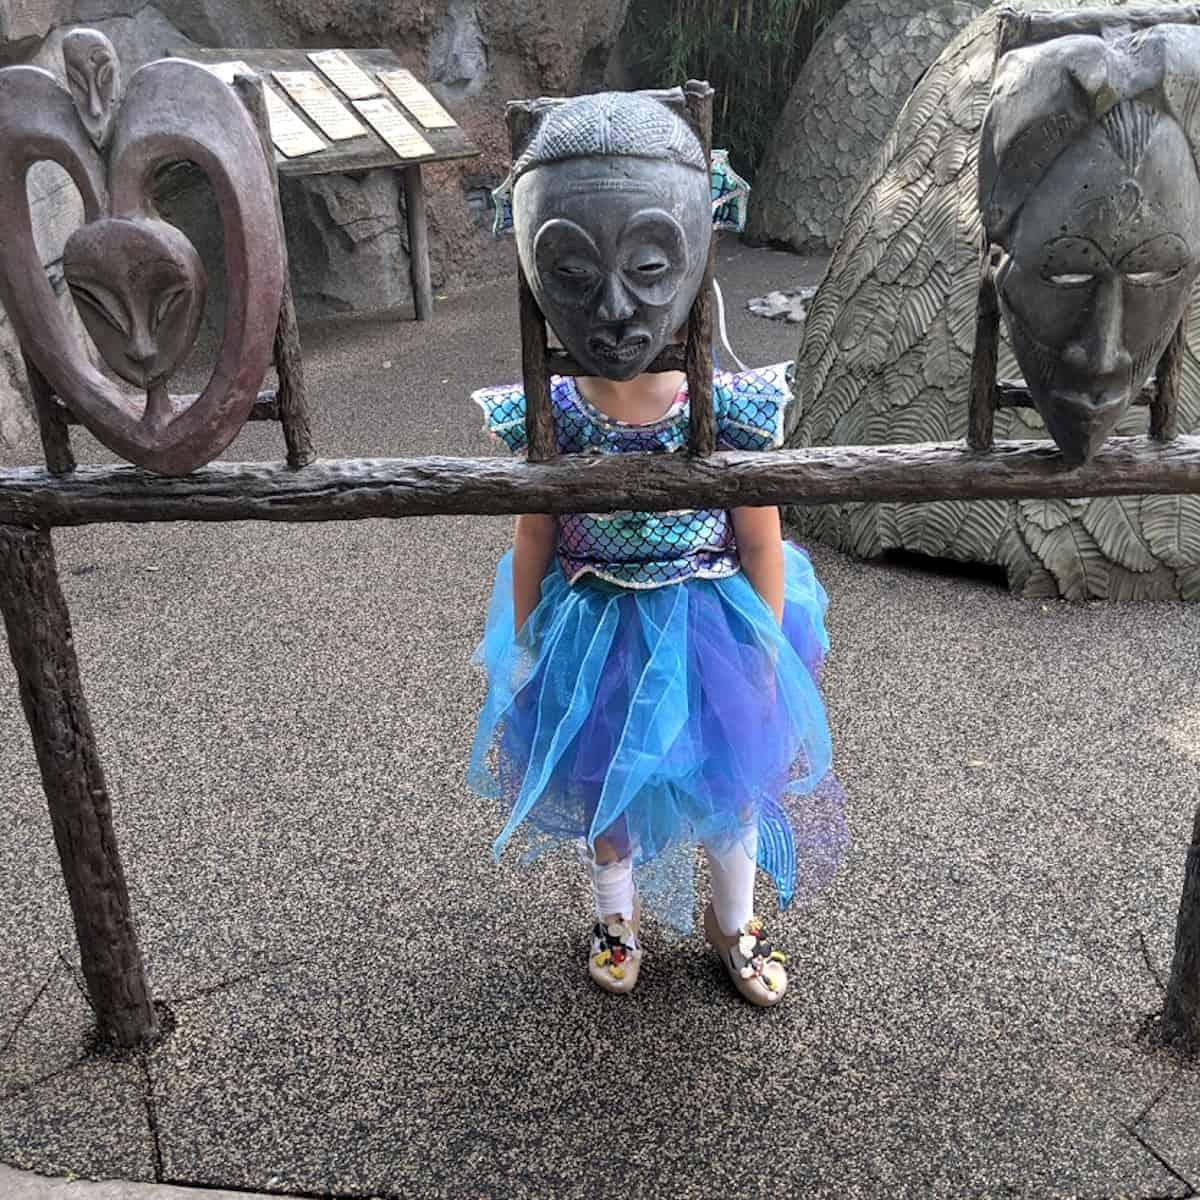 Wearing costume at Houston Zoo Zoo Boo